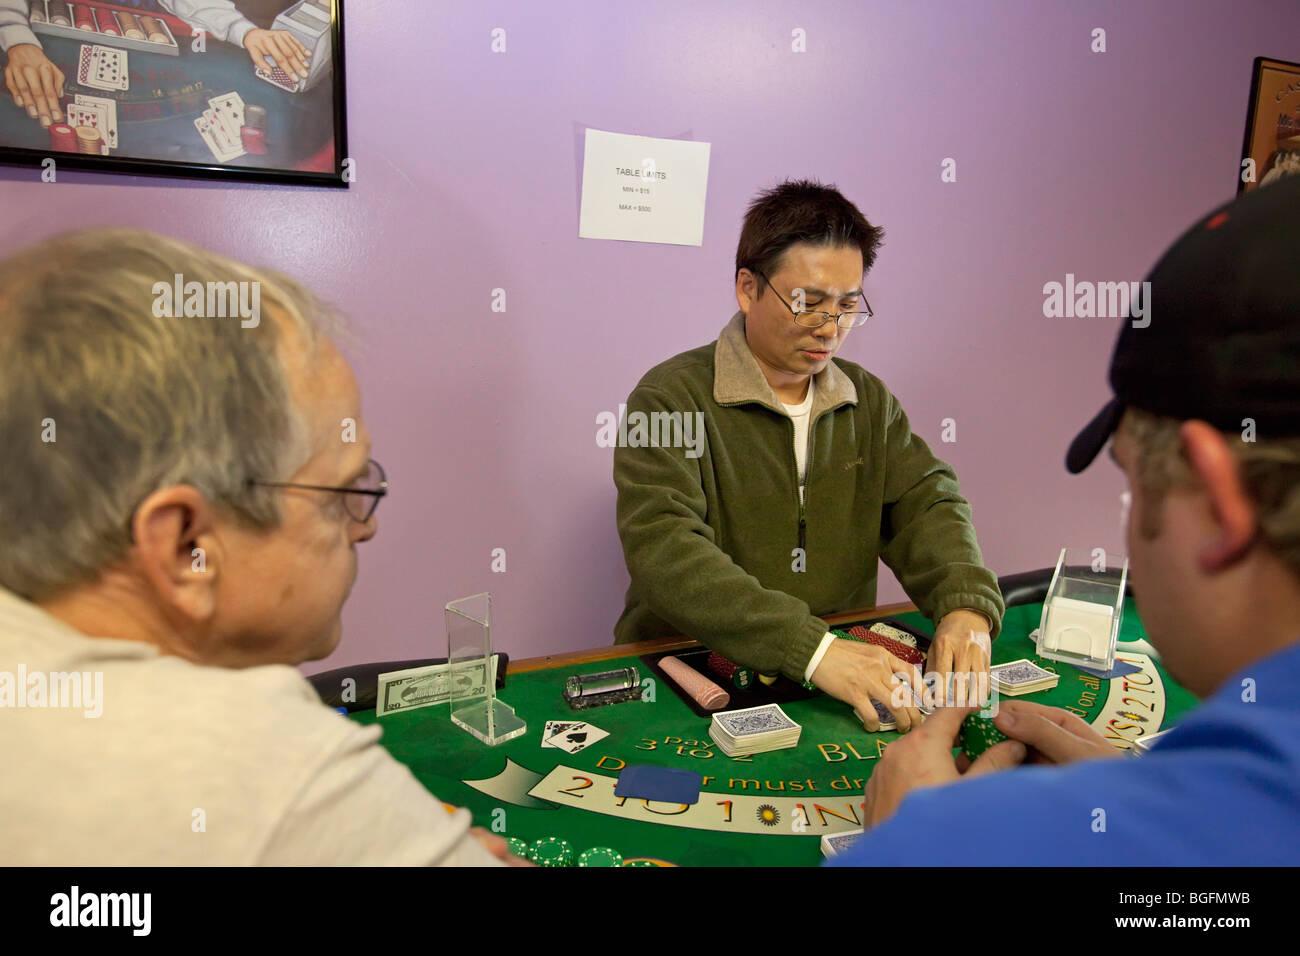 Casino training jobs list of casinos that offer voting bonuses